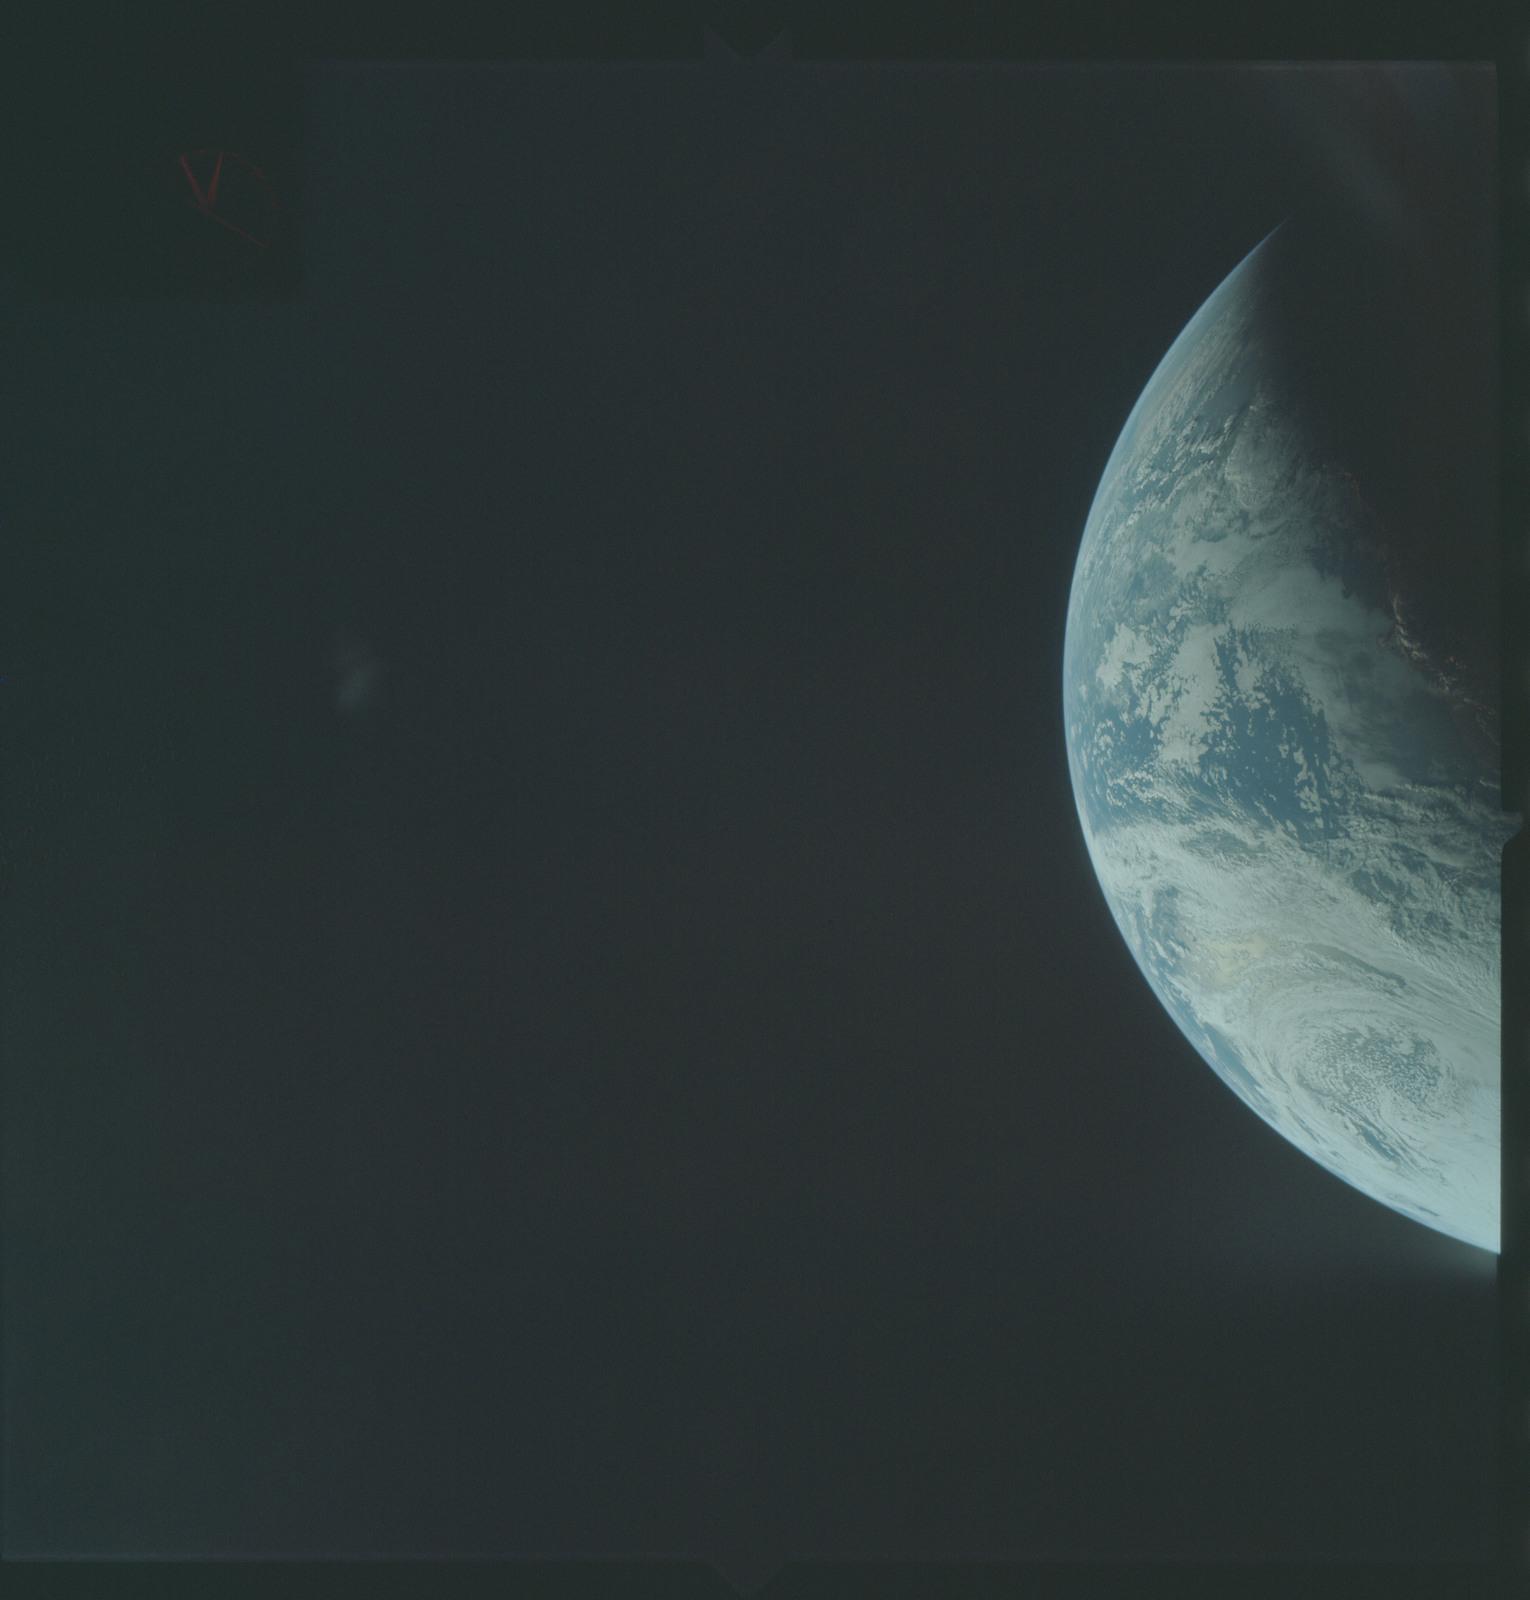 AS04-01-220 - Apollo 4 - Apollo 4 Mission - Atlantic Ocean,coastal Brazil and West Africa